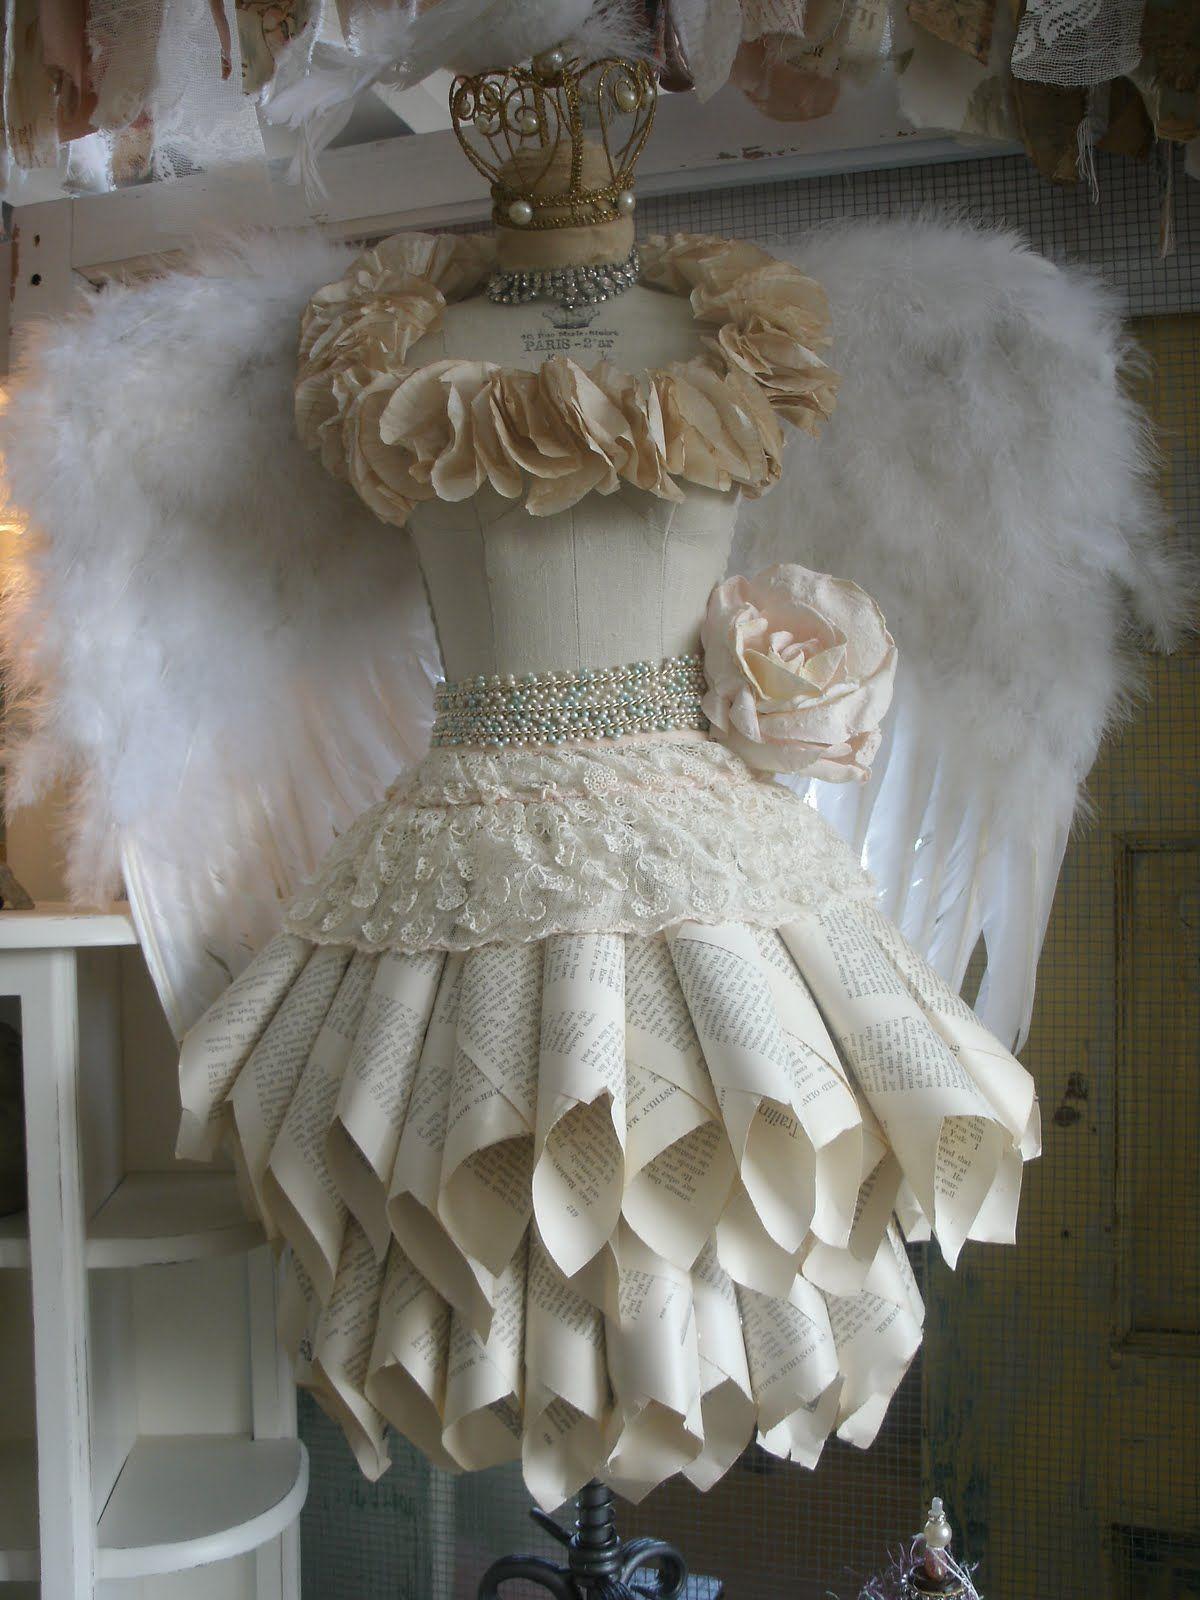 Design Chic Decorative Dress Form Home Decorating Ideas